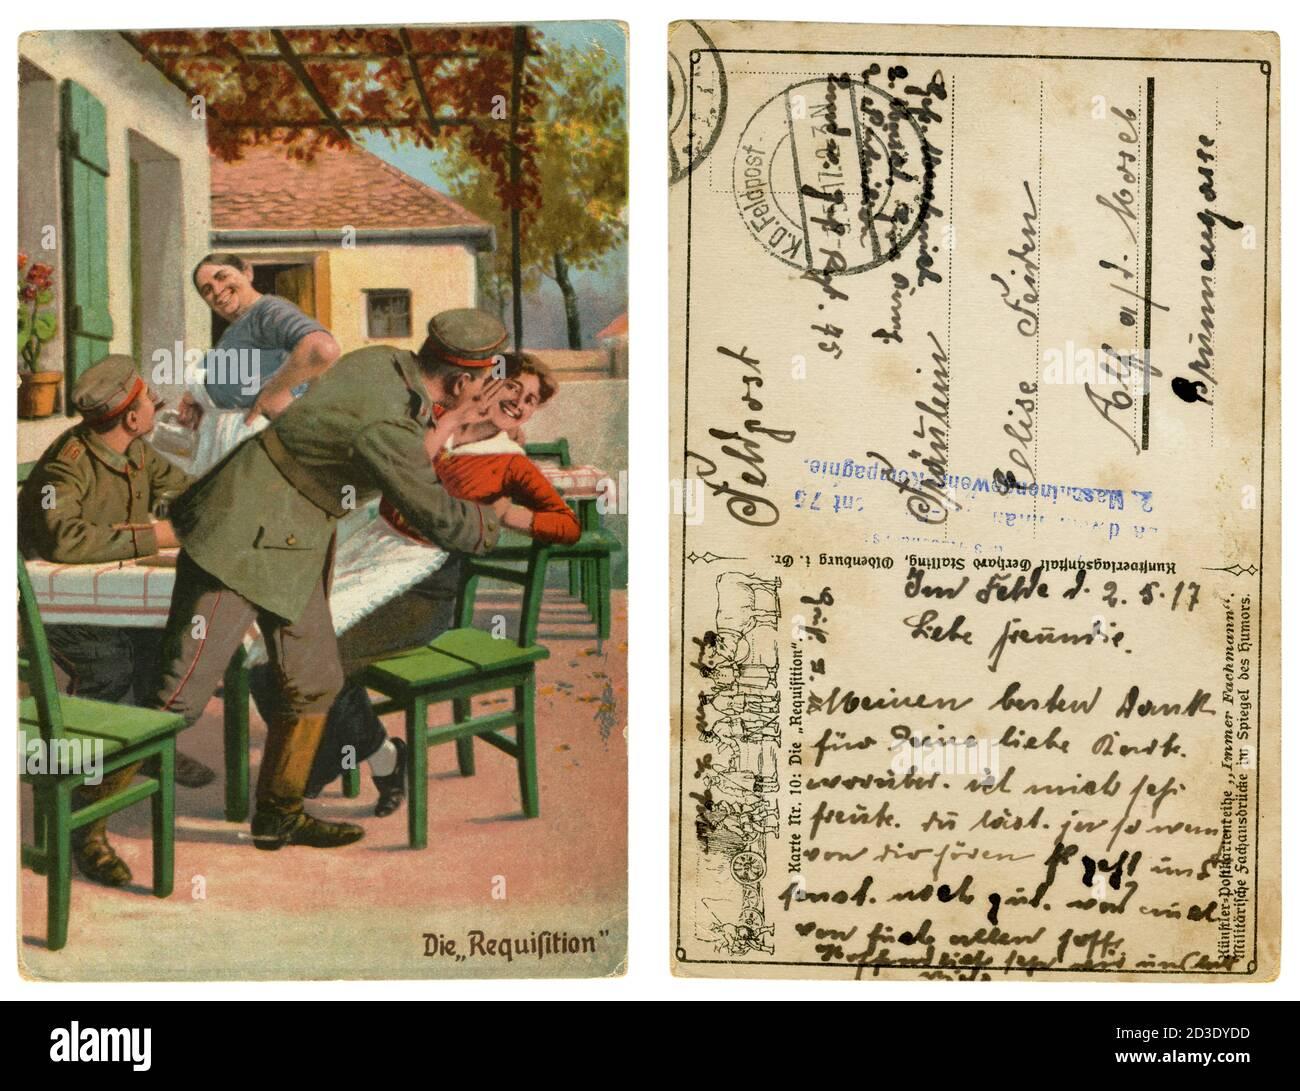 Postal histórica alemana: Humor militar, 'solicitud' un soldado 'requisitiong' una joven de un café de verano, la guerra mundial 1914-1918, al revés Foto de stock